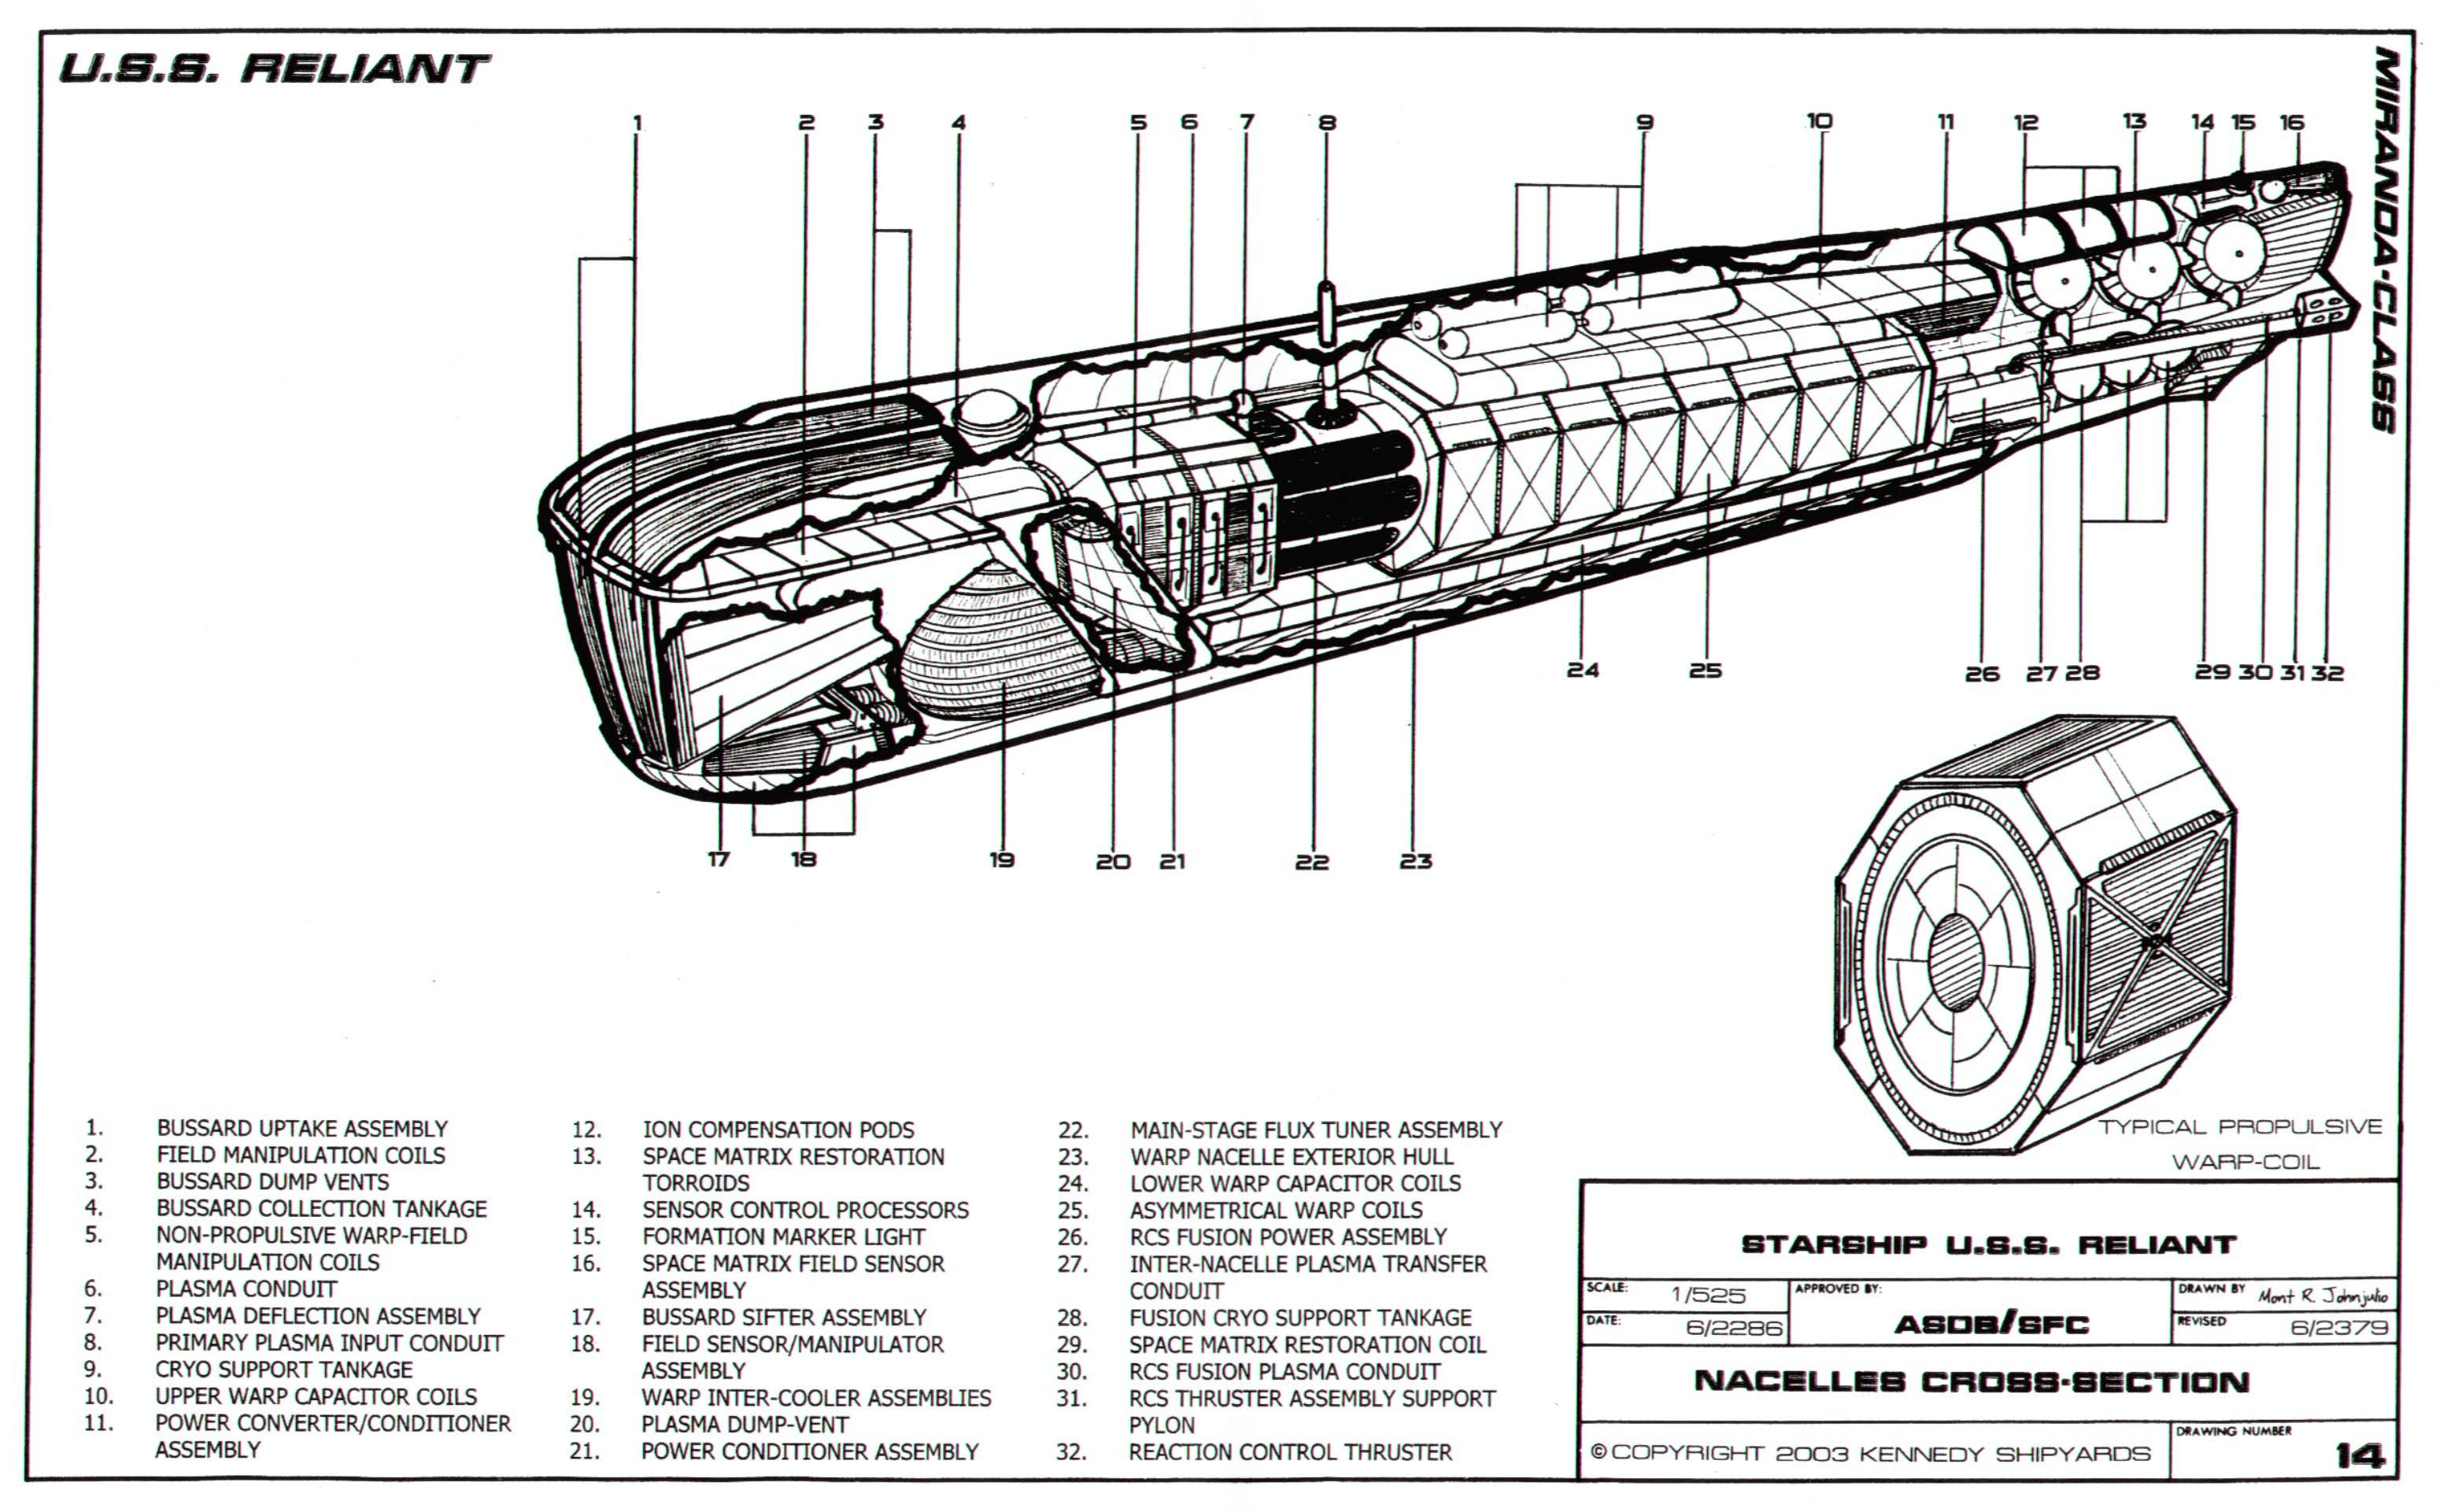 Star Trek Blueprints: Miranda Class Starship U.S.S